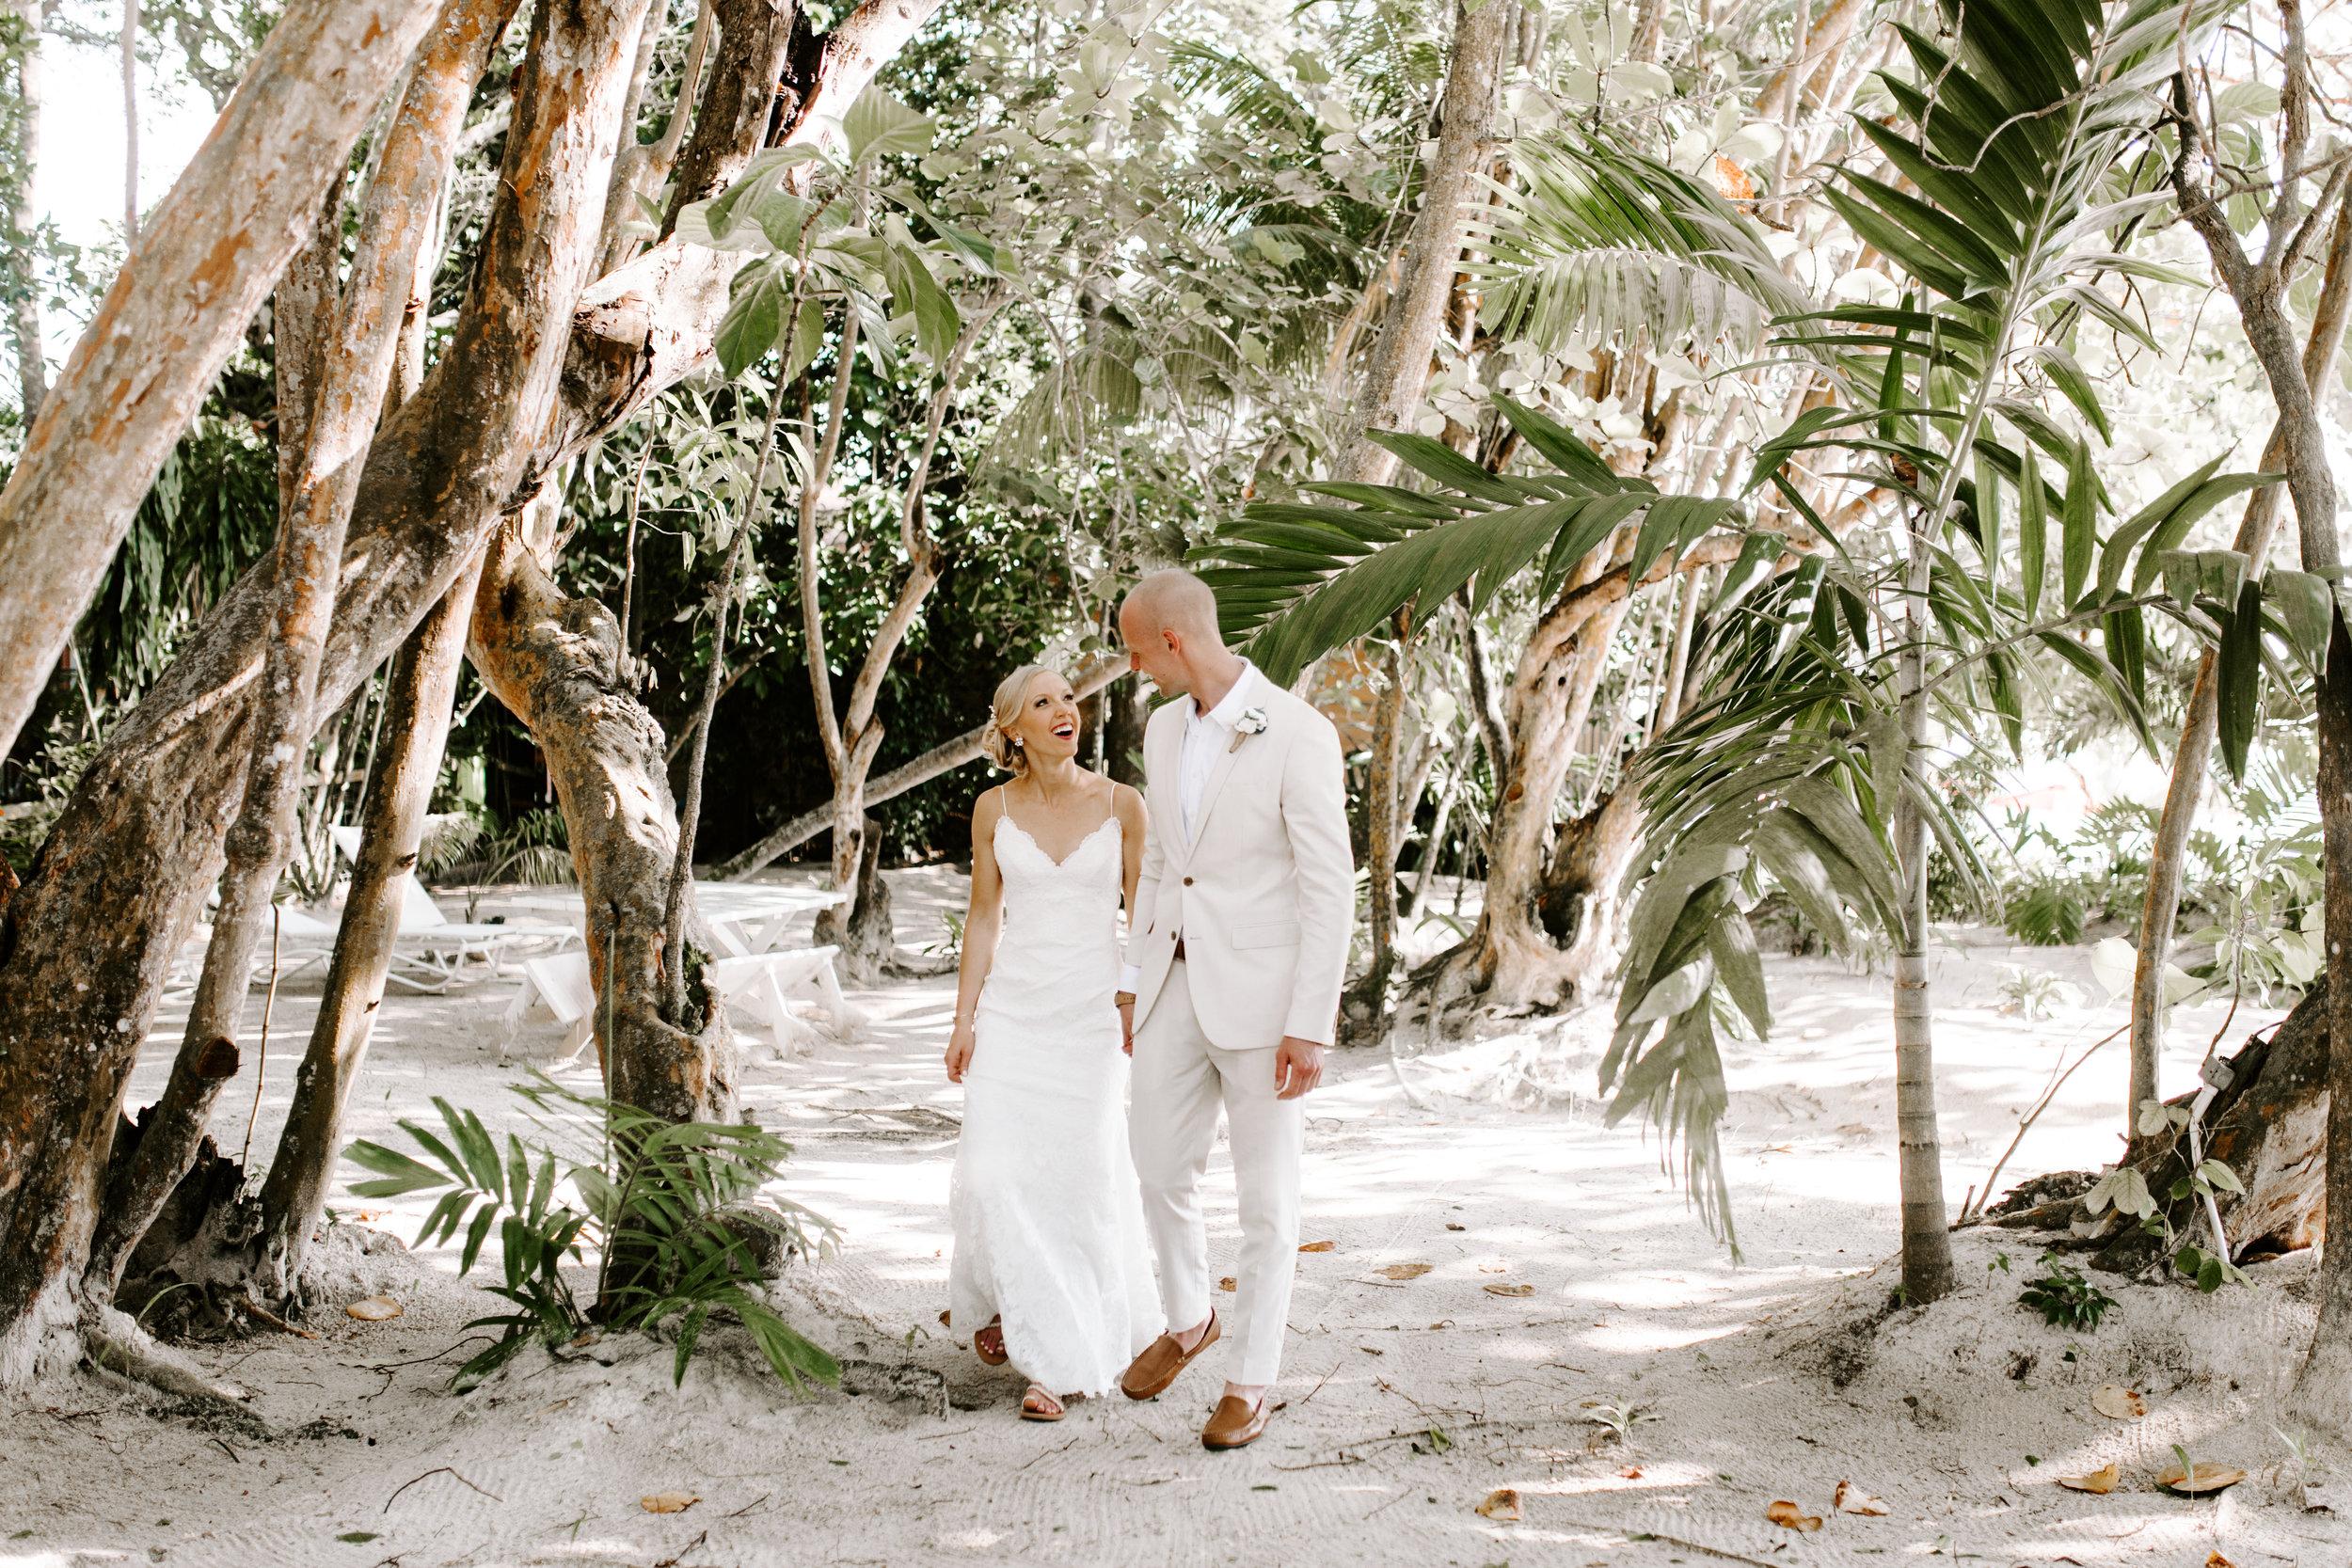 beach wedding, destination wedding, jamaica wedding recap, beach bride, beach wedding dress, wedding day, define fettle